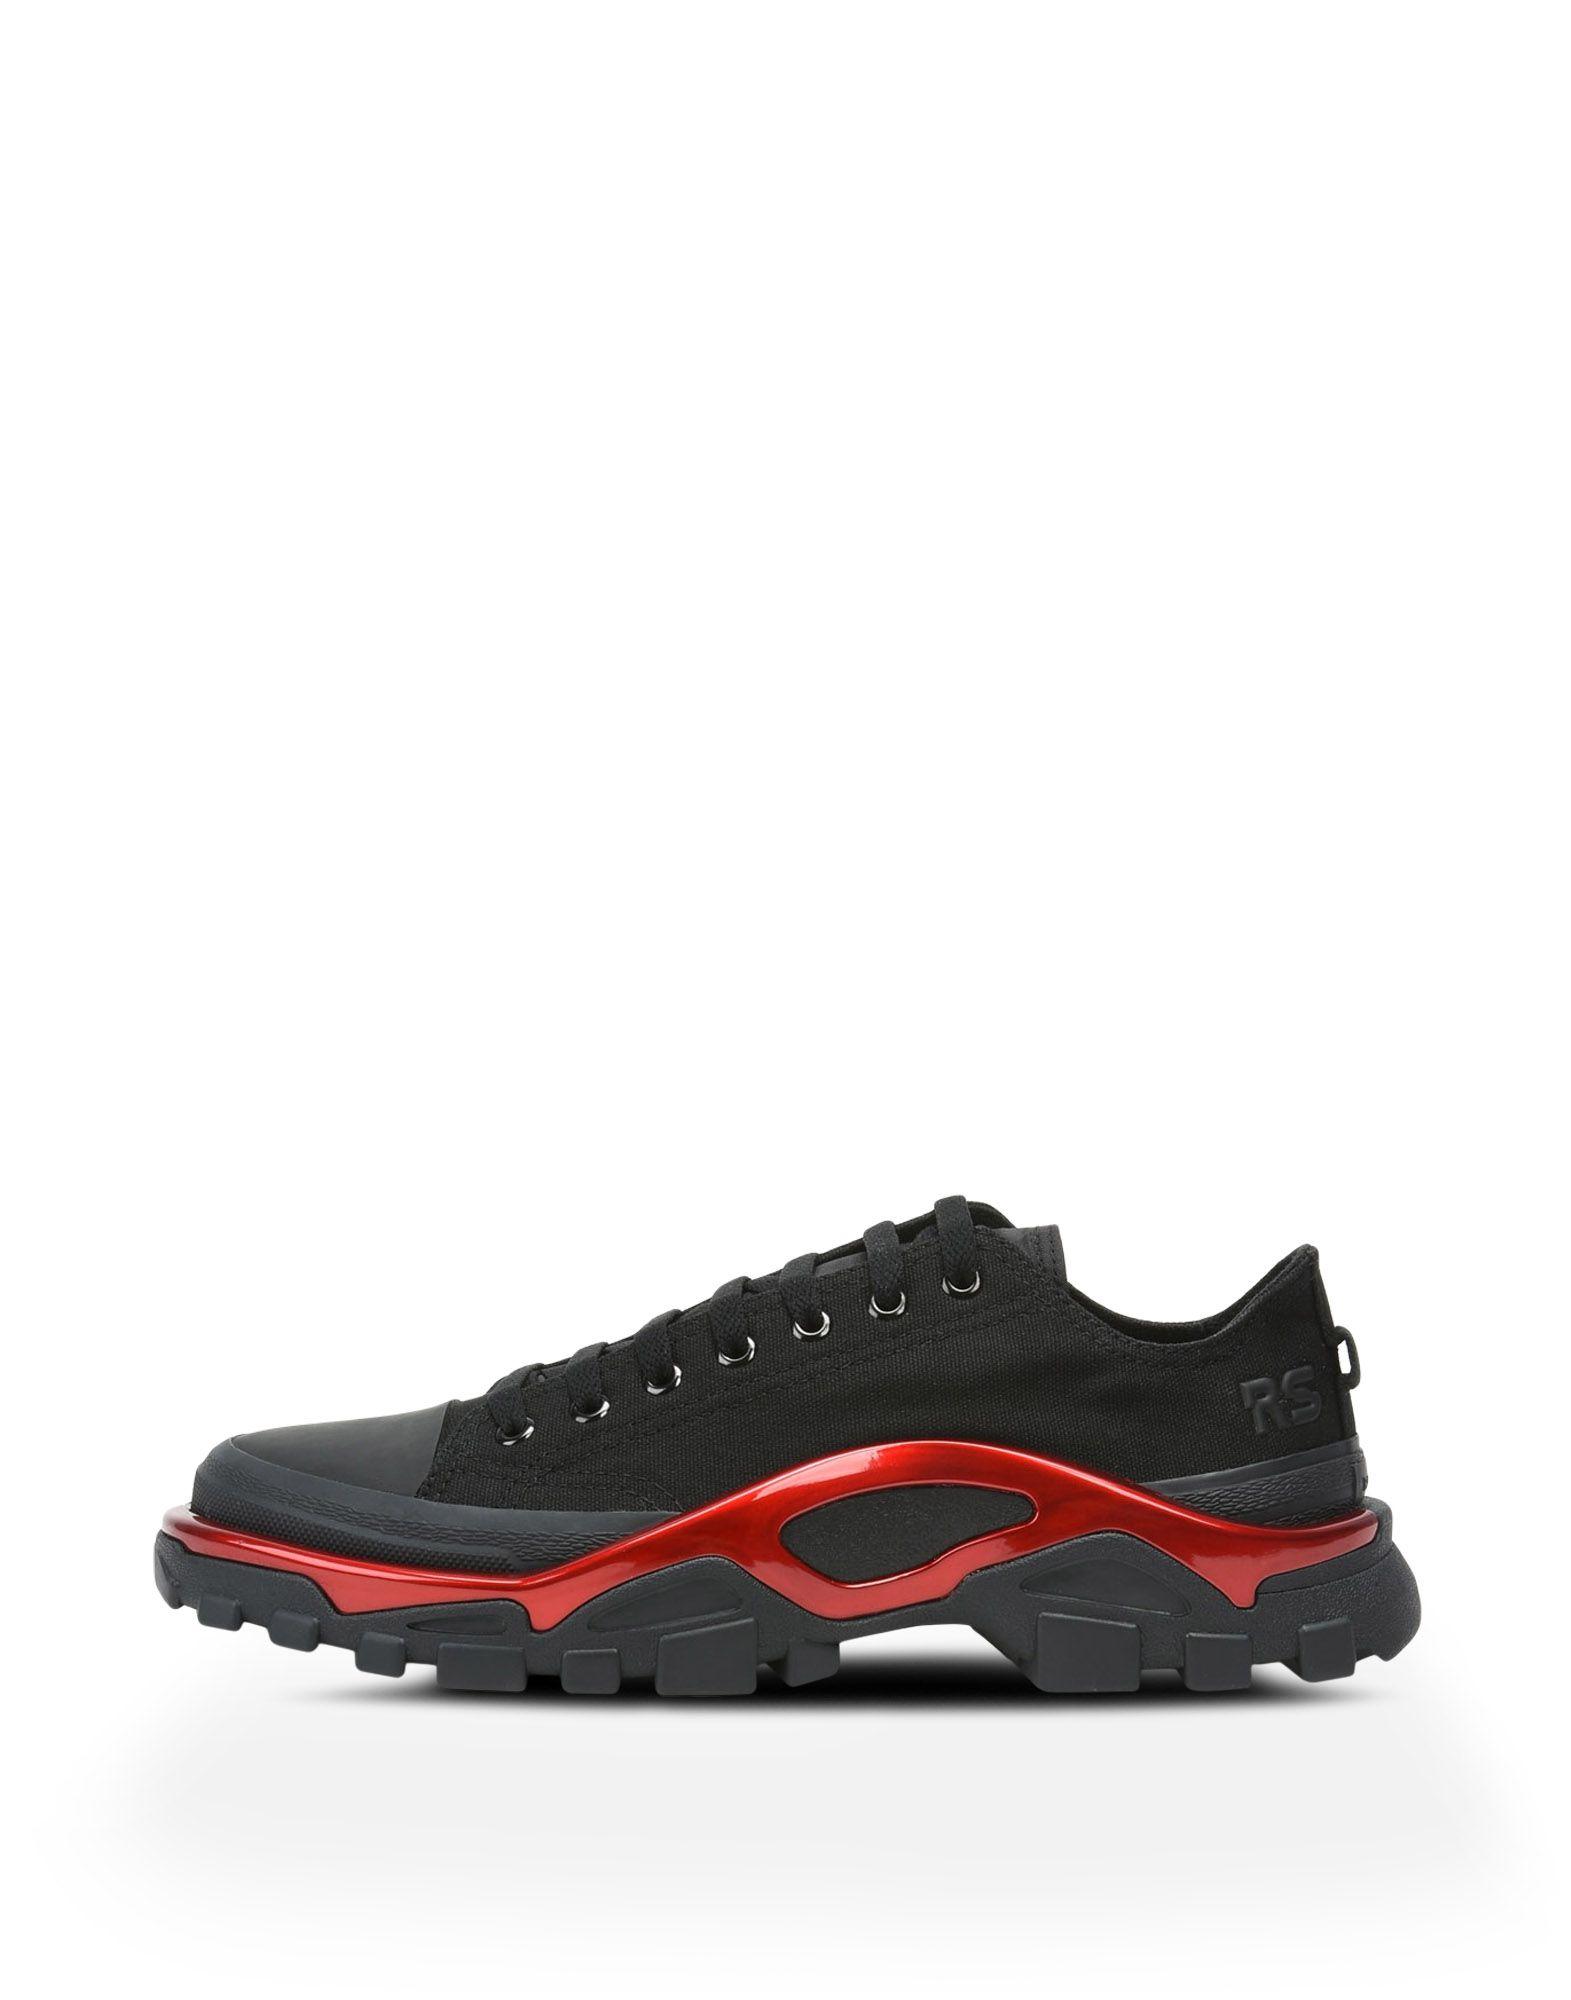 adidas X Adidas Detroit Runner Sneakers 9dBXa